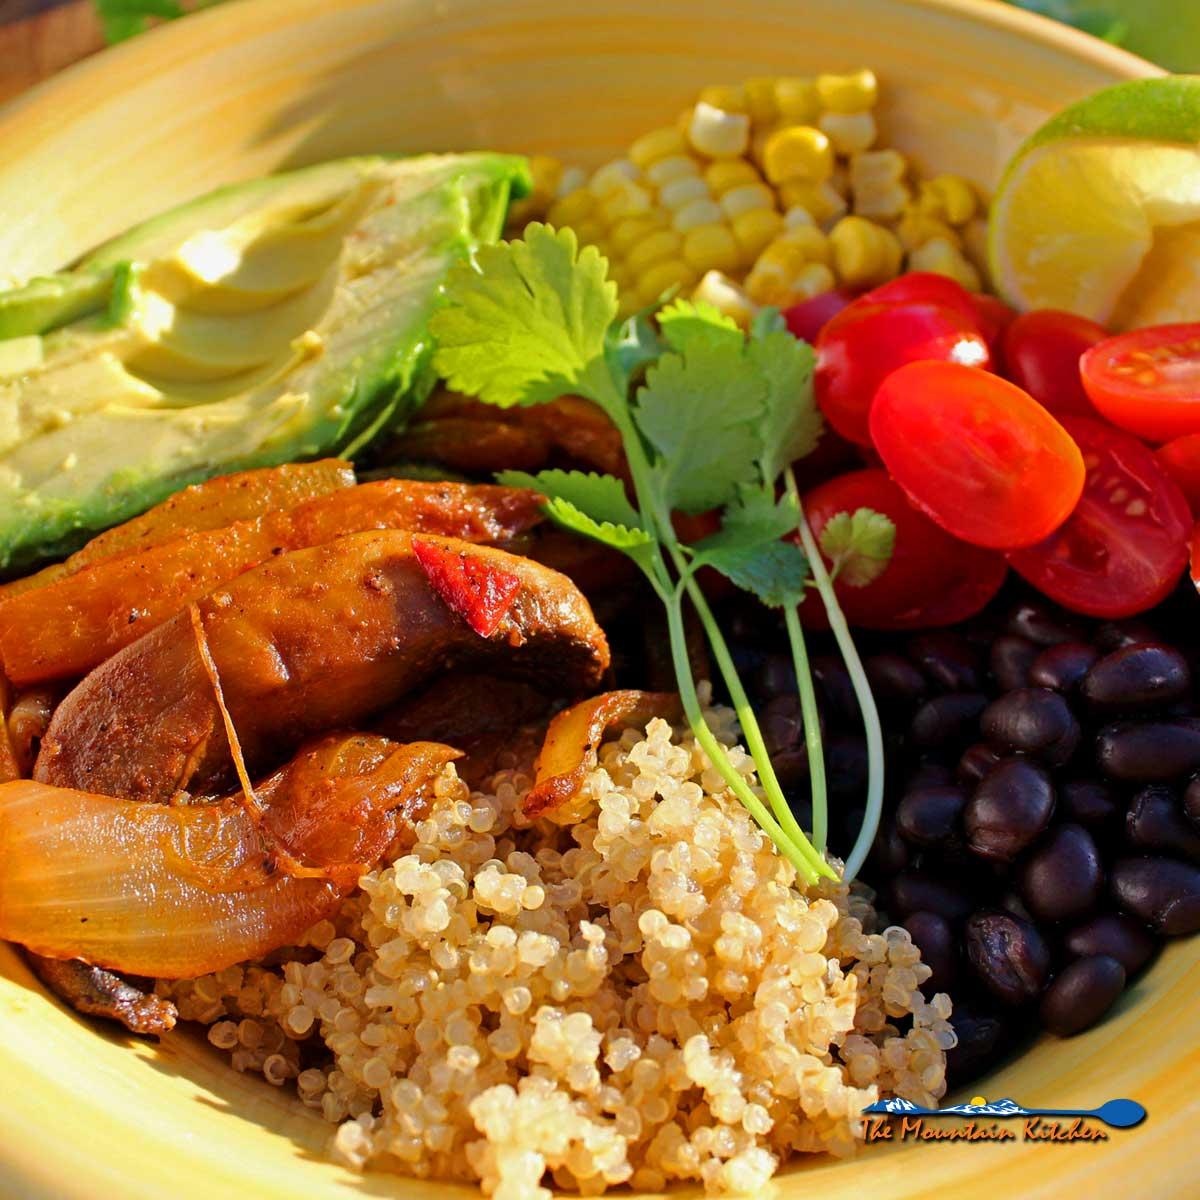 Vegetarian Quinoa Fajita Bowls {A Meatless Monday Recipe